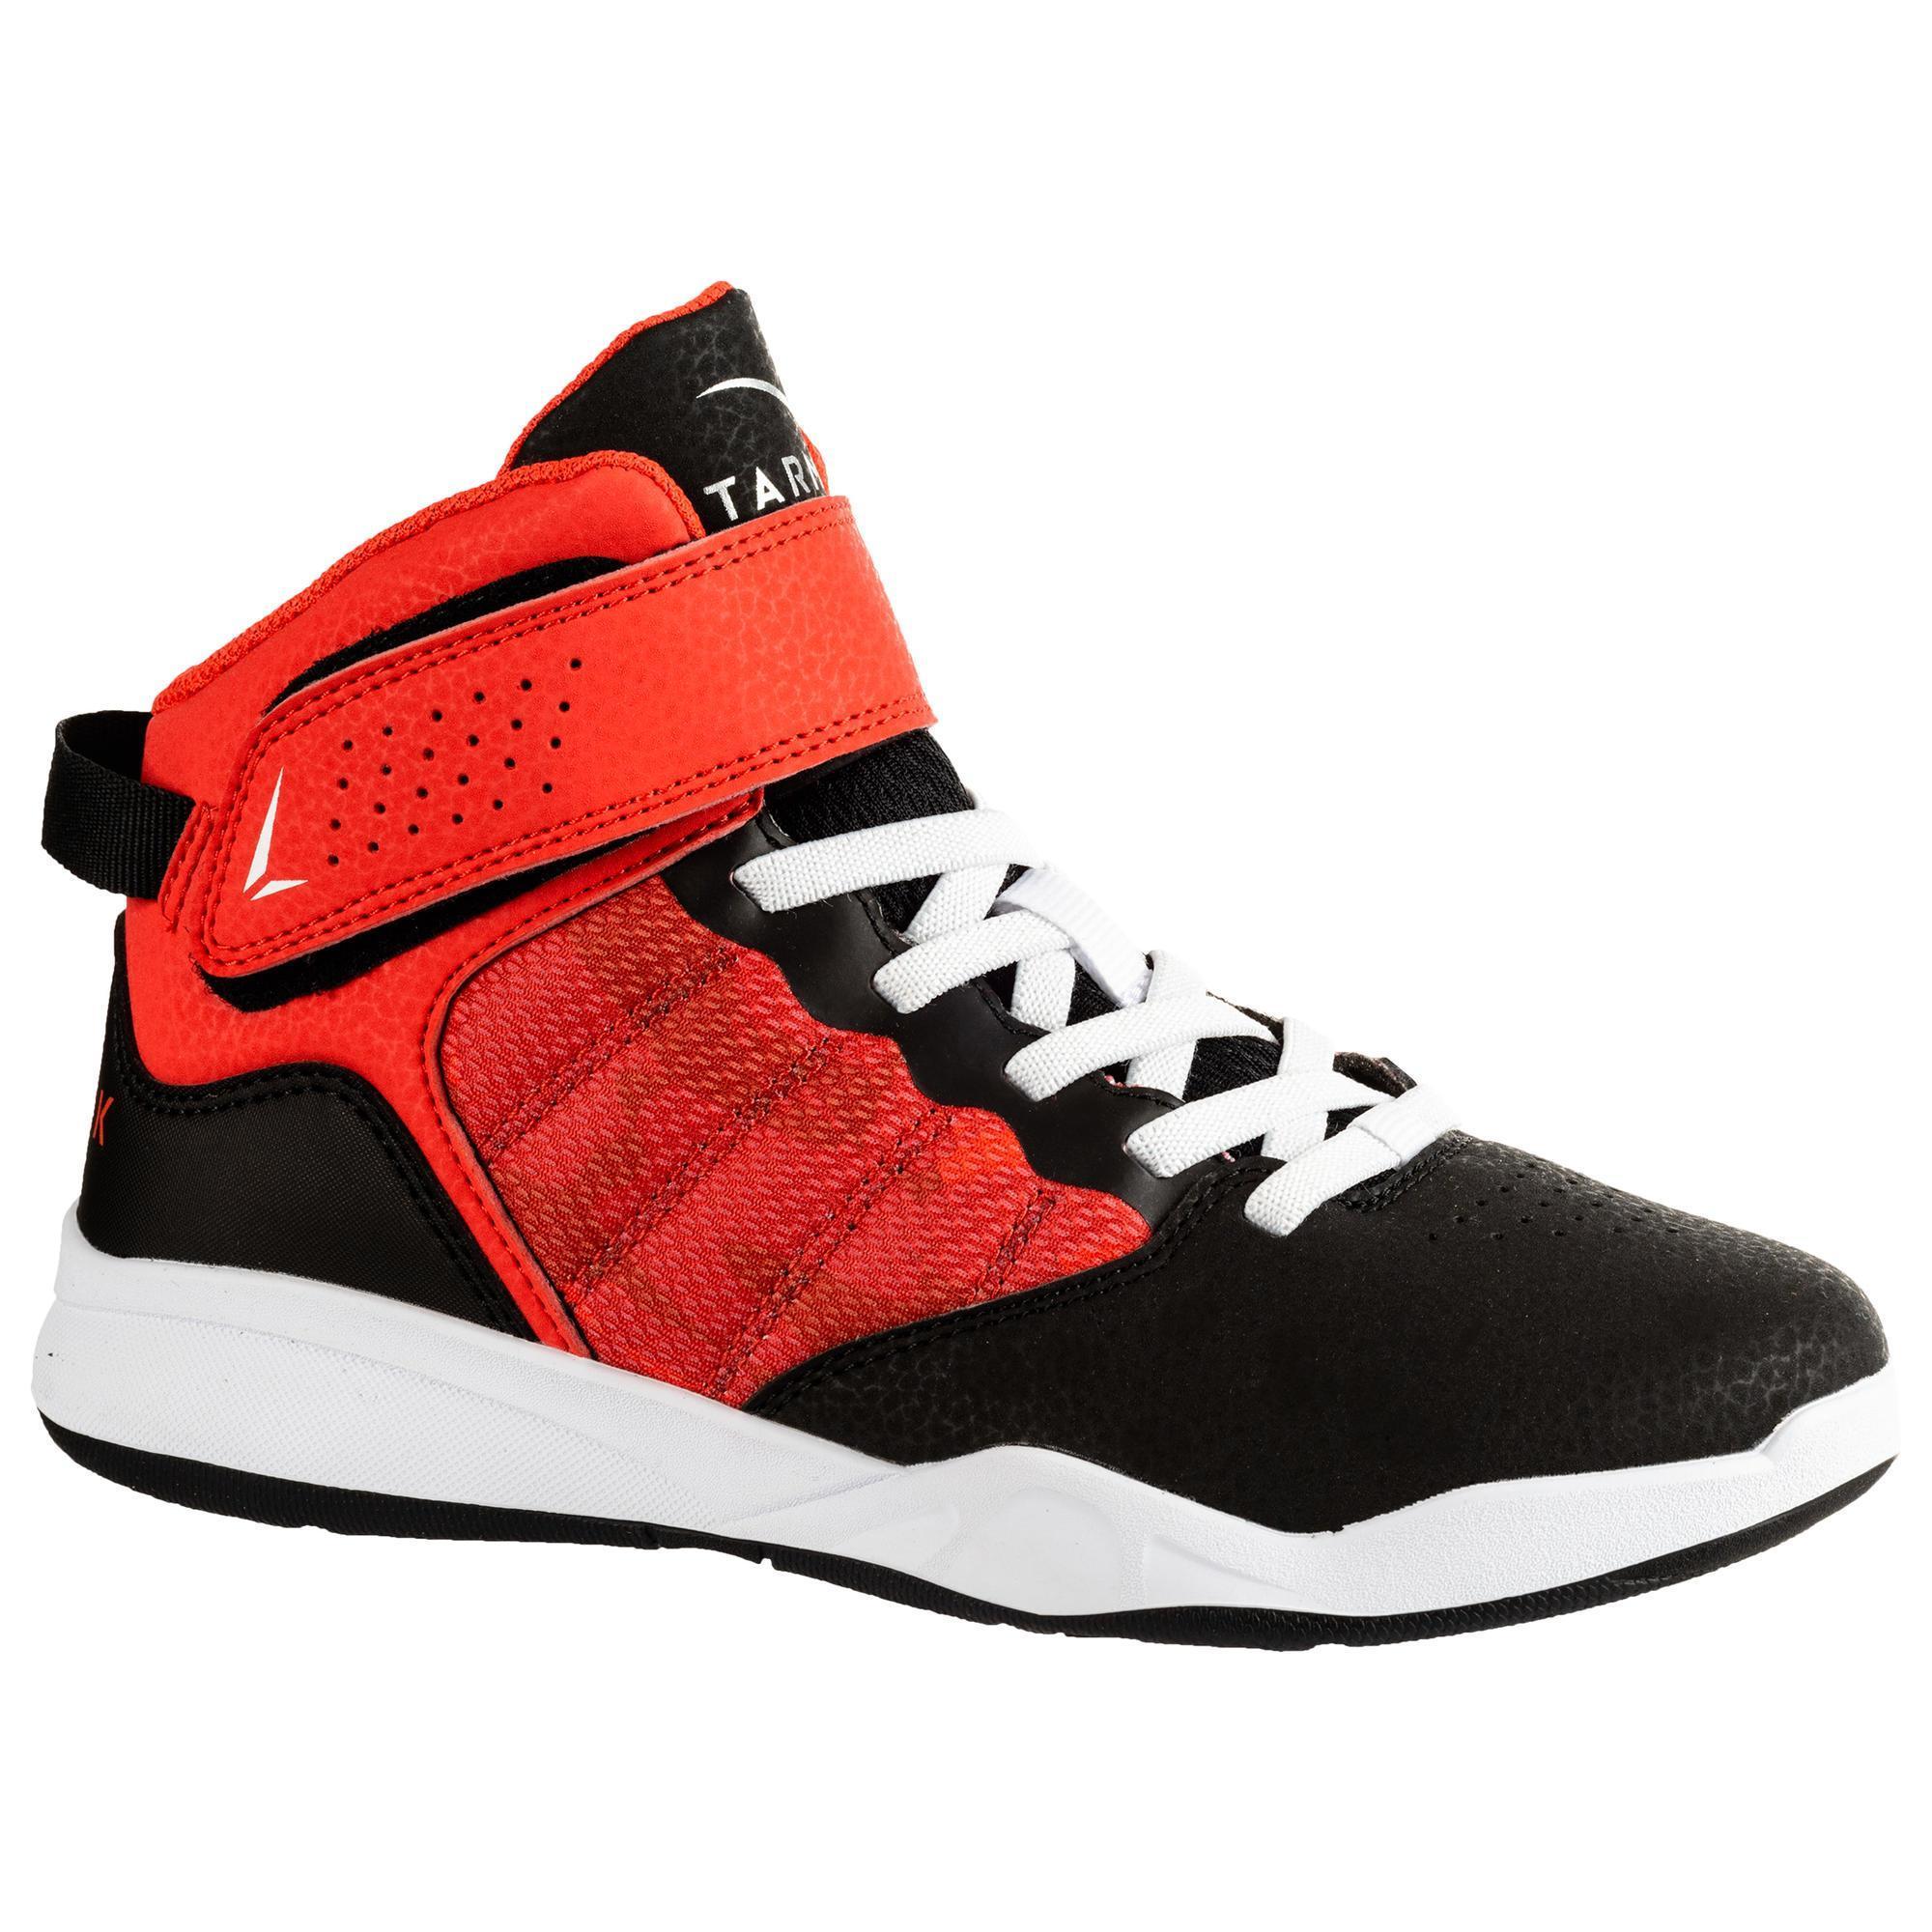 Adult \u0026 Kids Basketball Shoes Hong Kong